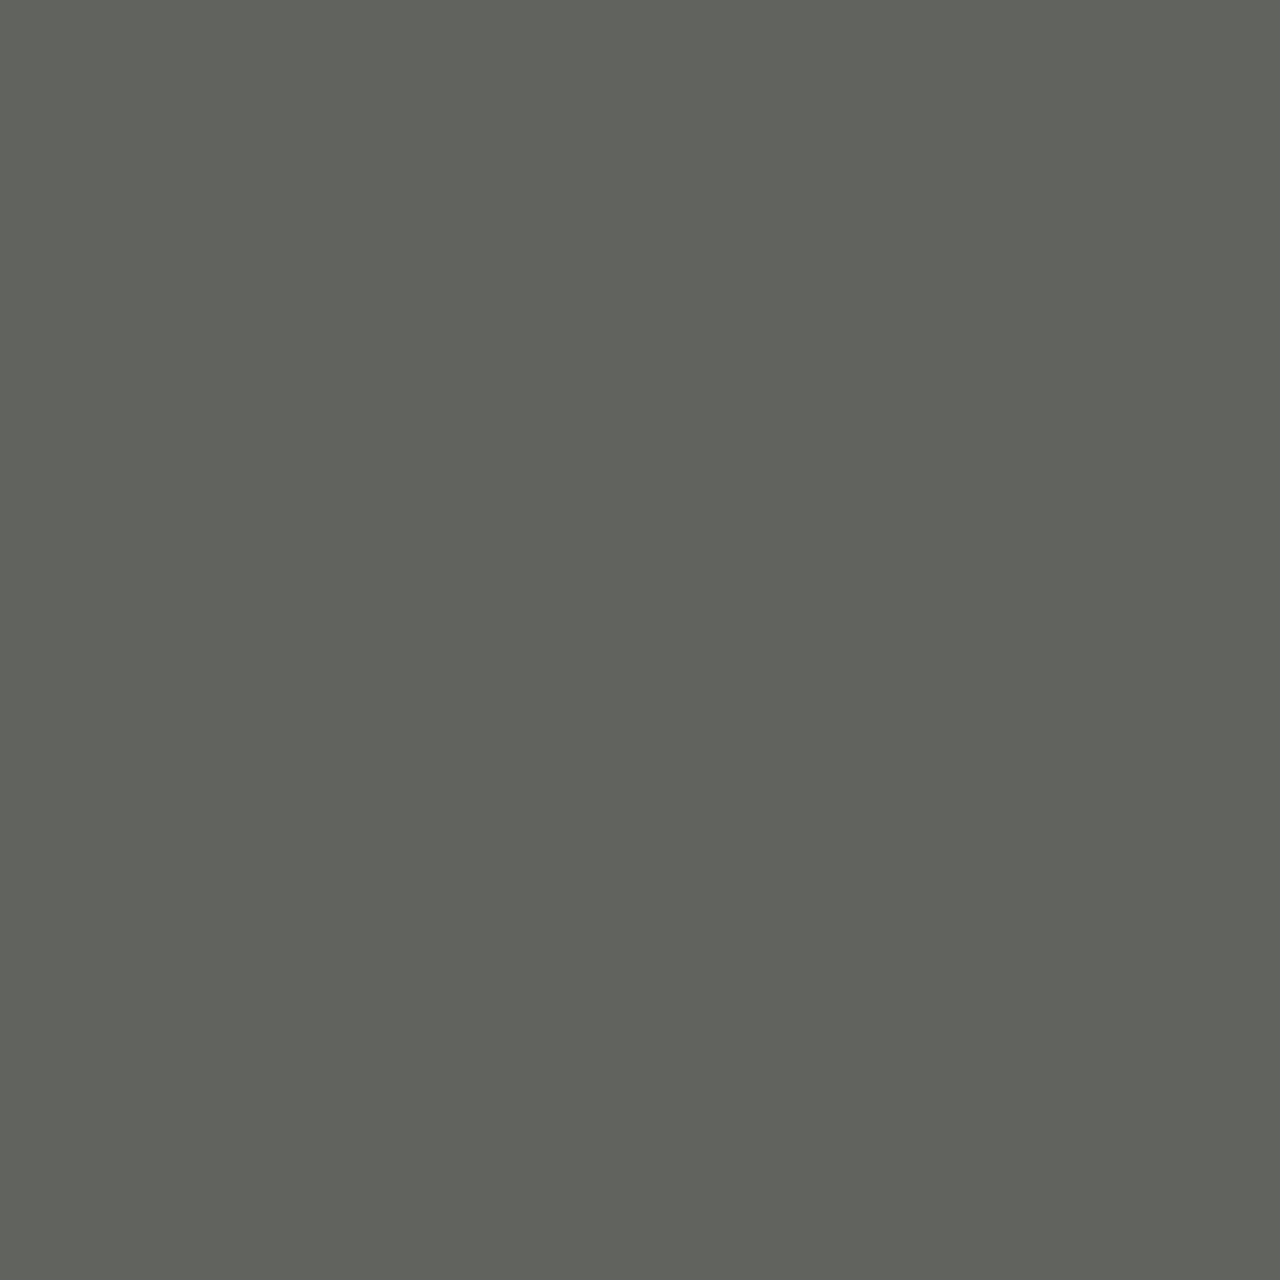 "SUPERIOR SEAMLESS PAPER BACKGROUND 53""X36' - THUNDER GREY"